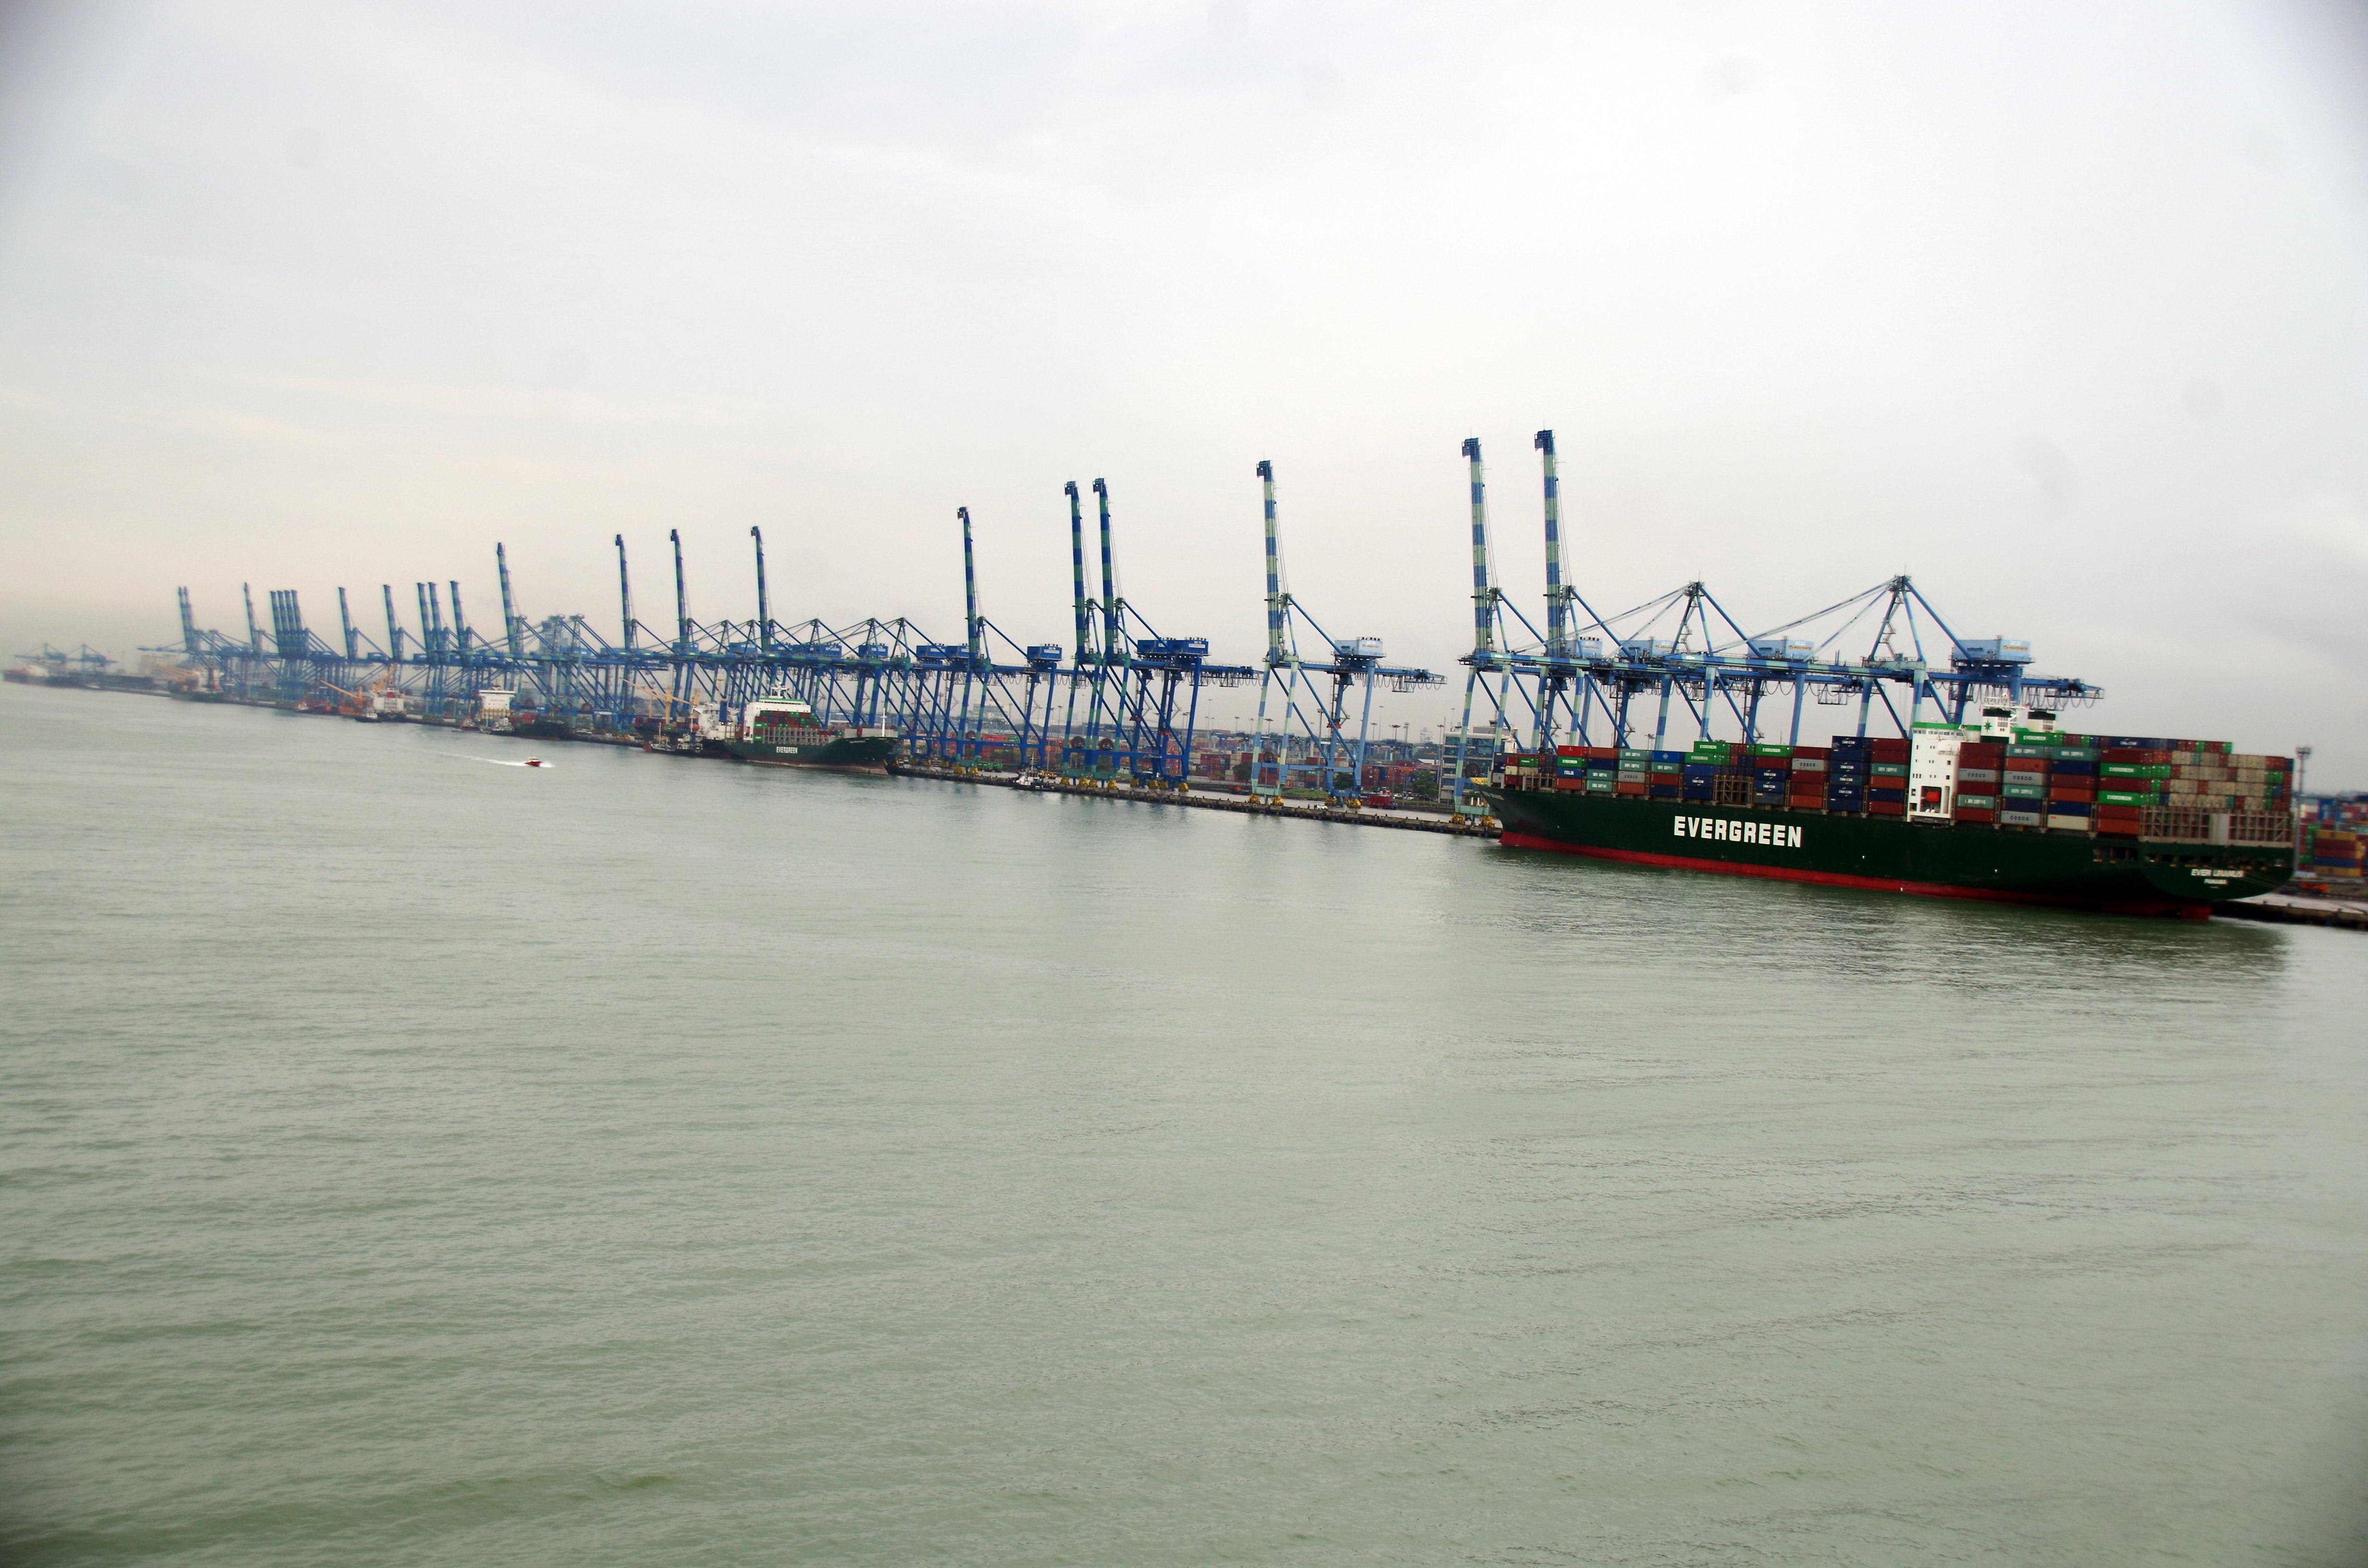 Picturesque Myport Photo Of File:my-port-klang-containerhafen.jpg